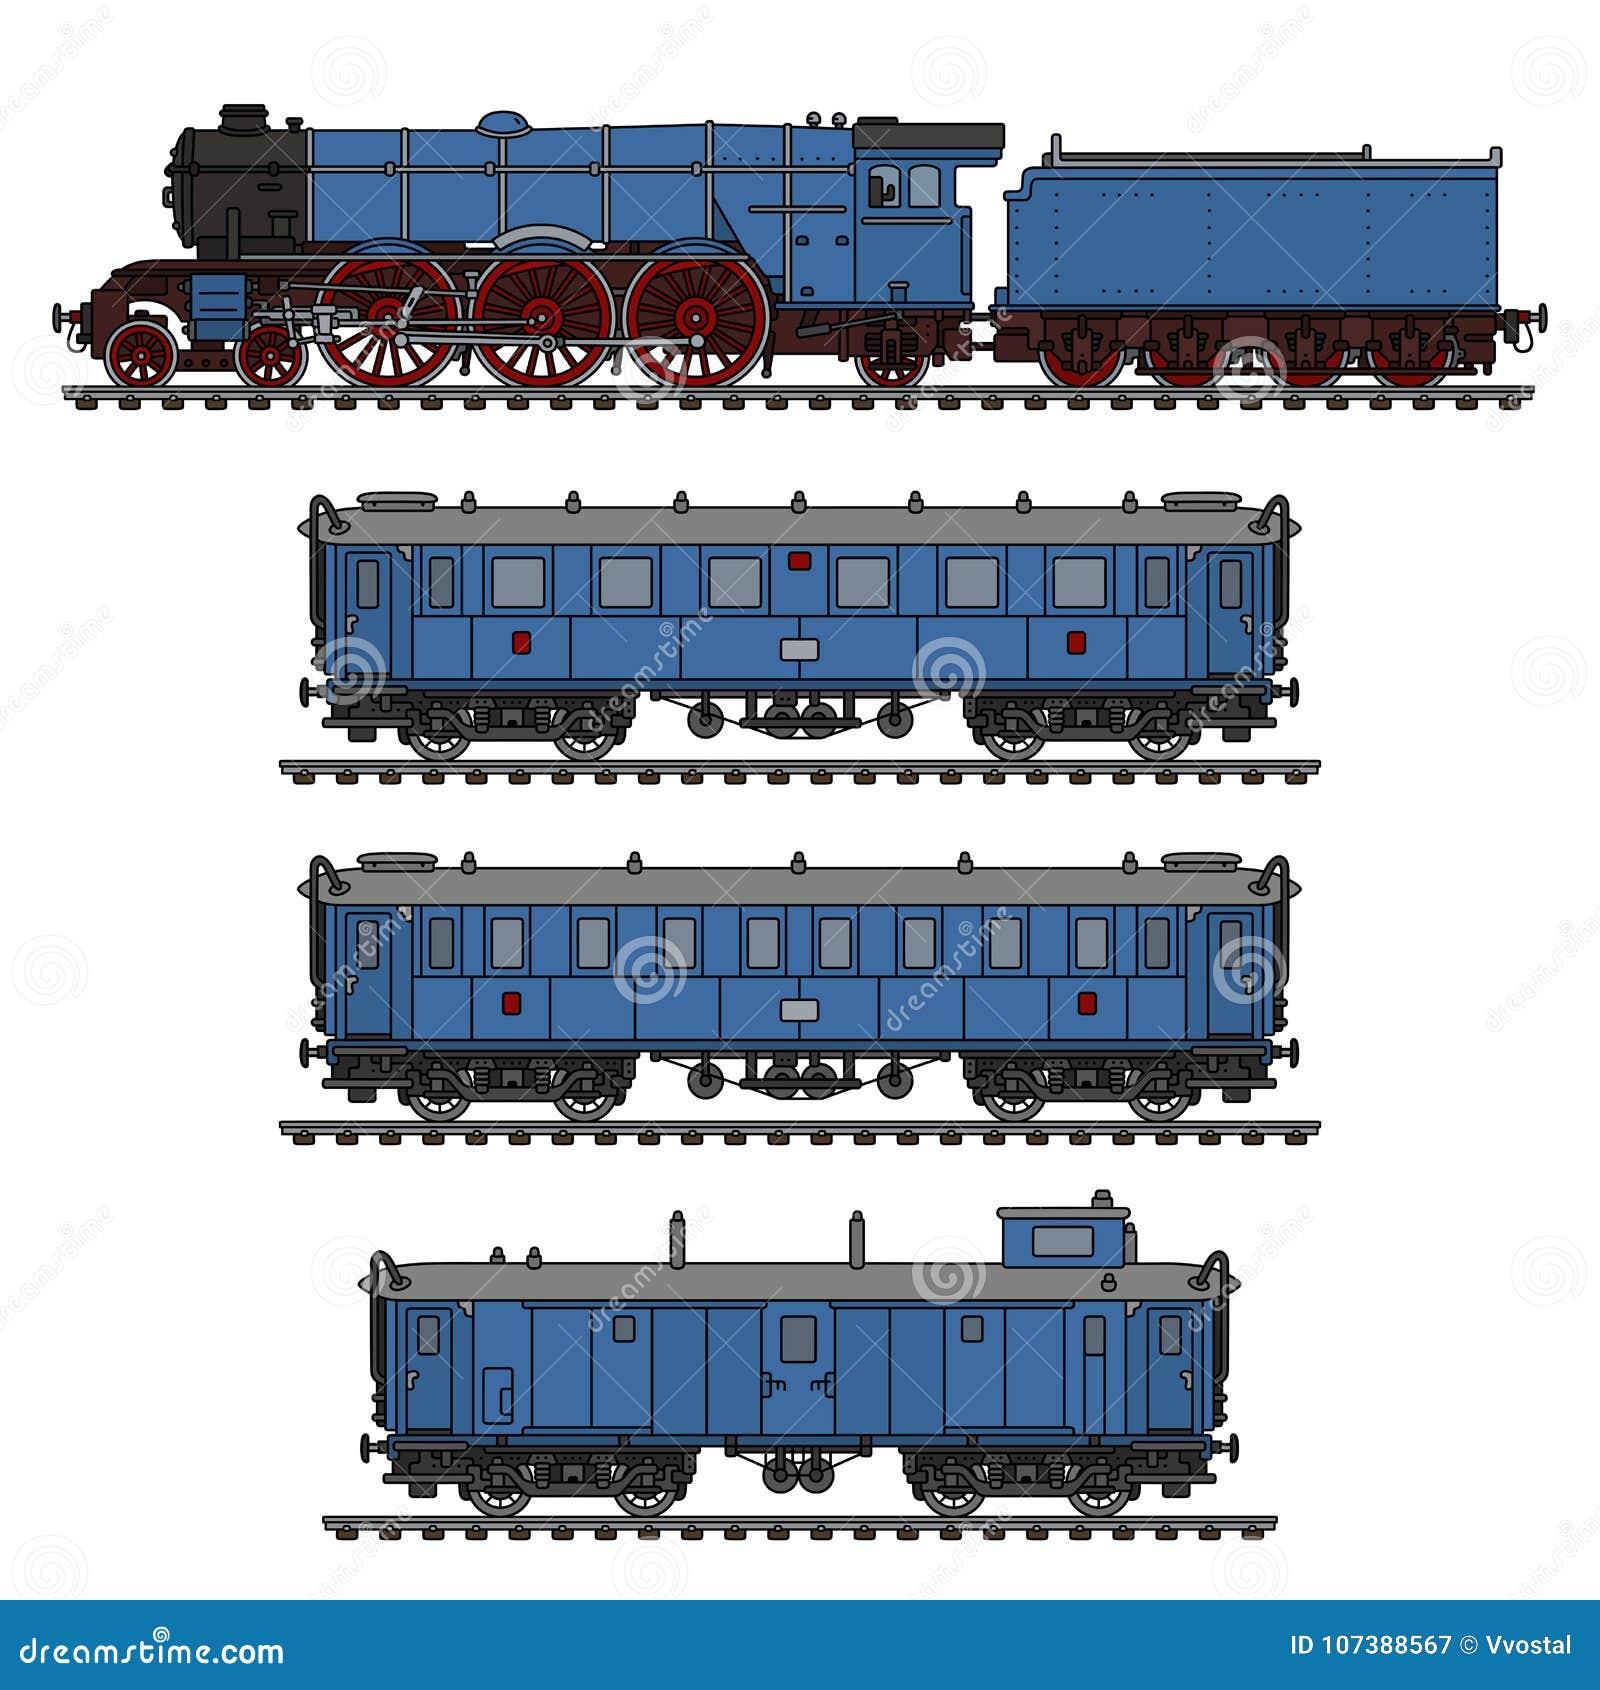 The vintage blue steam train